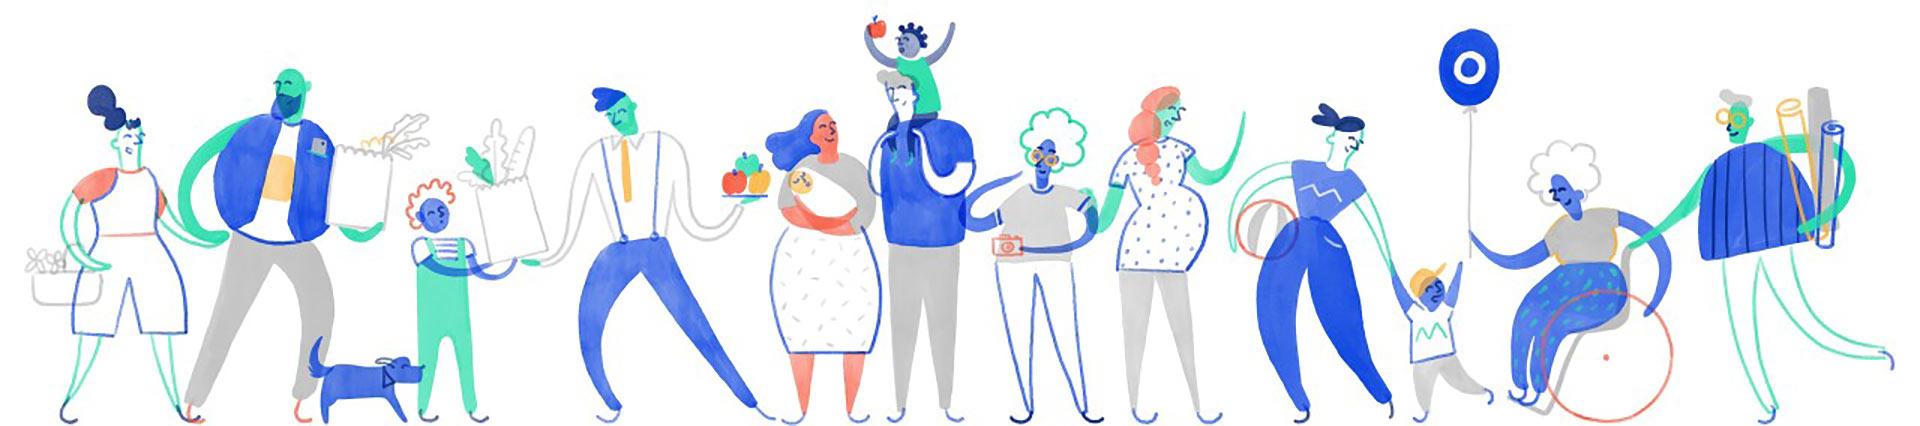 شبکه اجتماعی سلامت